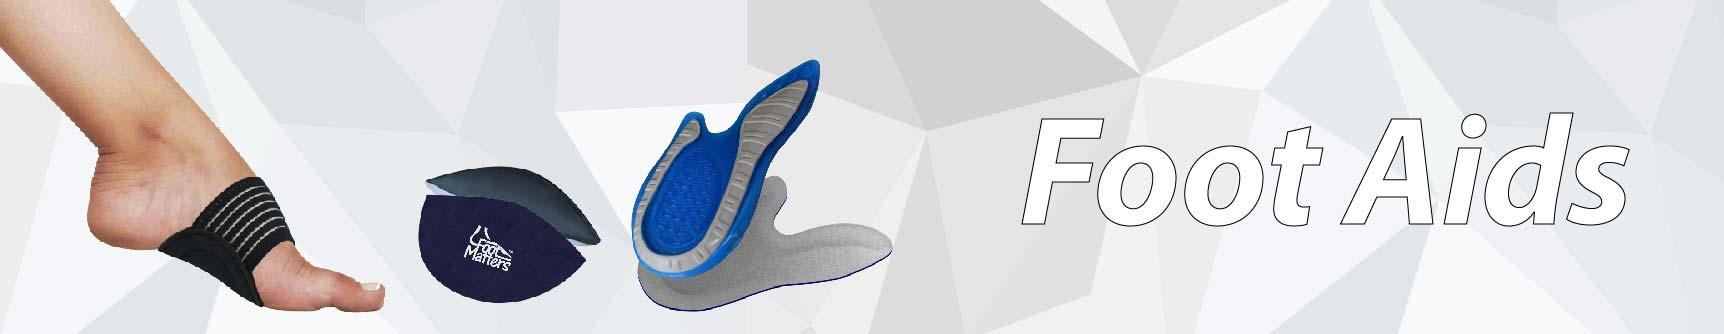 FootMatters Premium Gel Heel Pain Cushion with Arch Cushion Size US Men 8-13